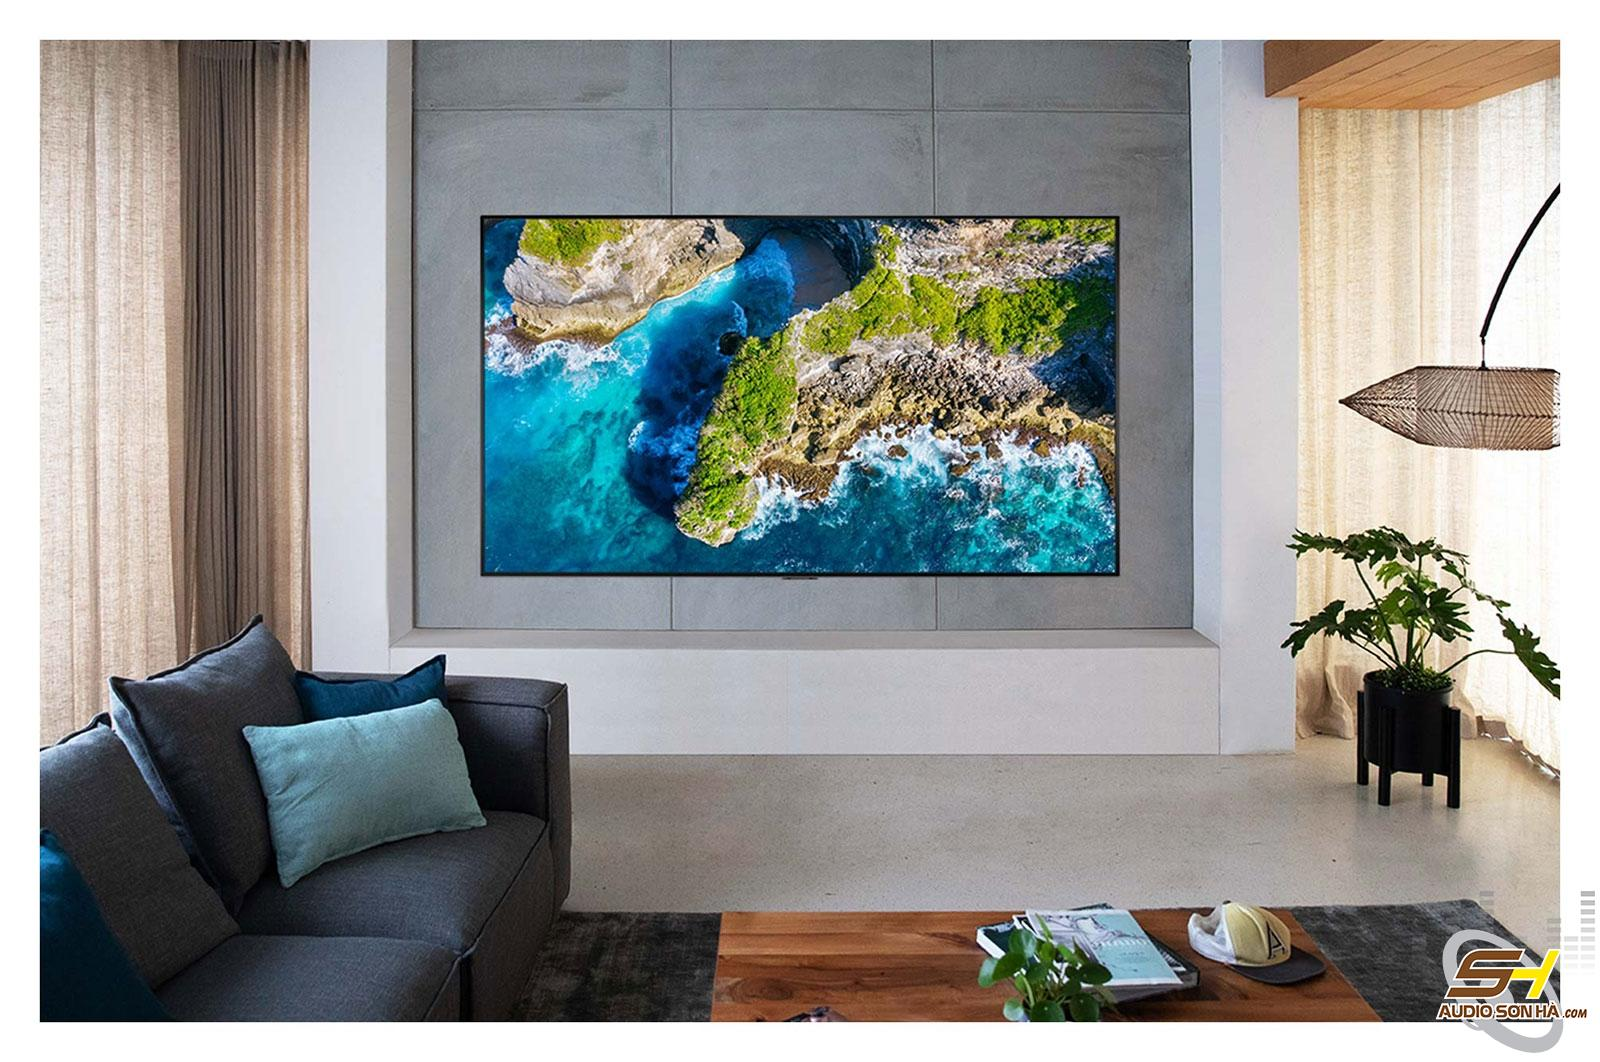 LG ZX 77 inch 8K SIGNATURE OLED TV